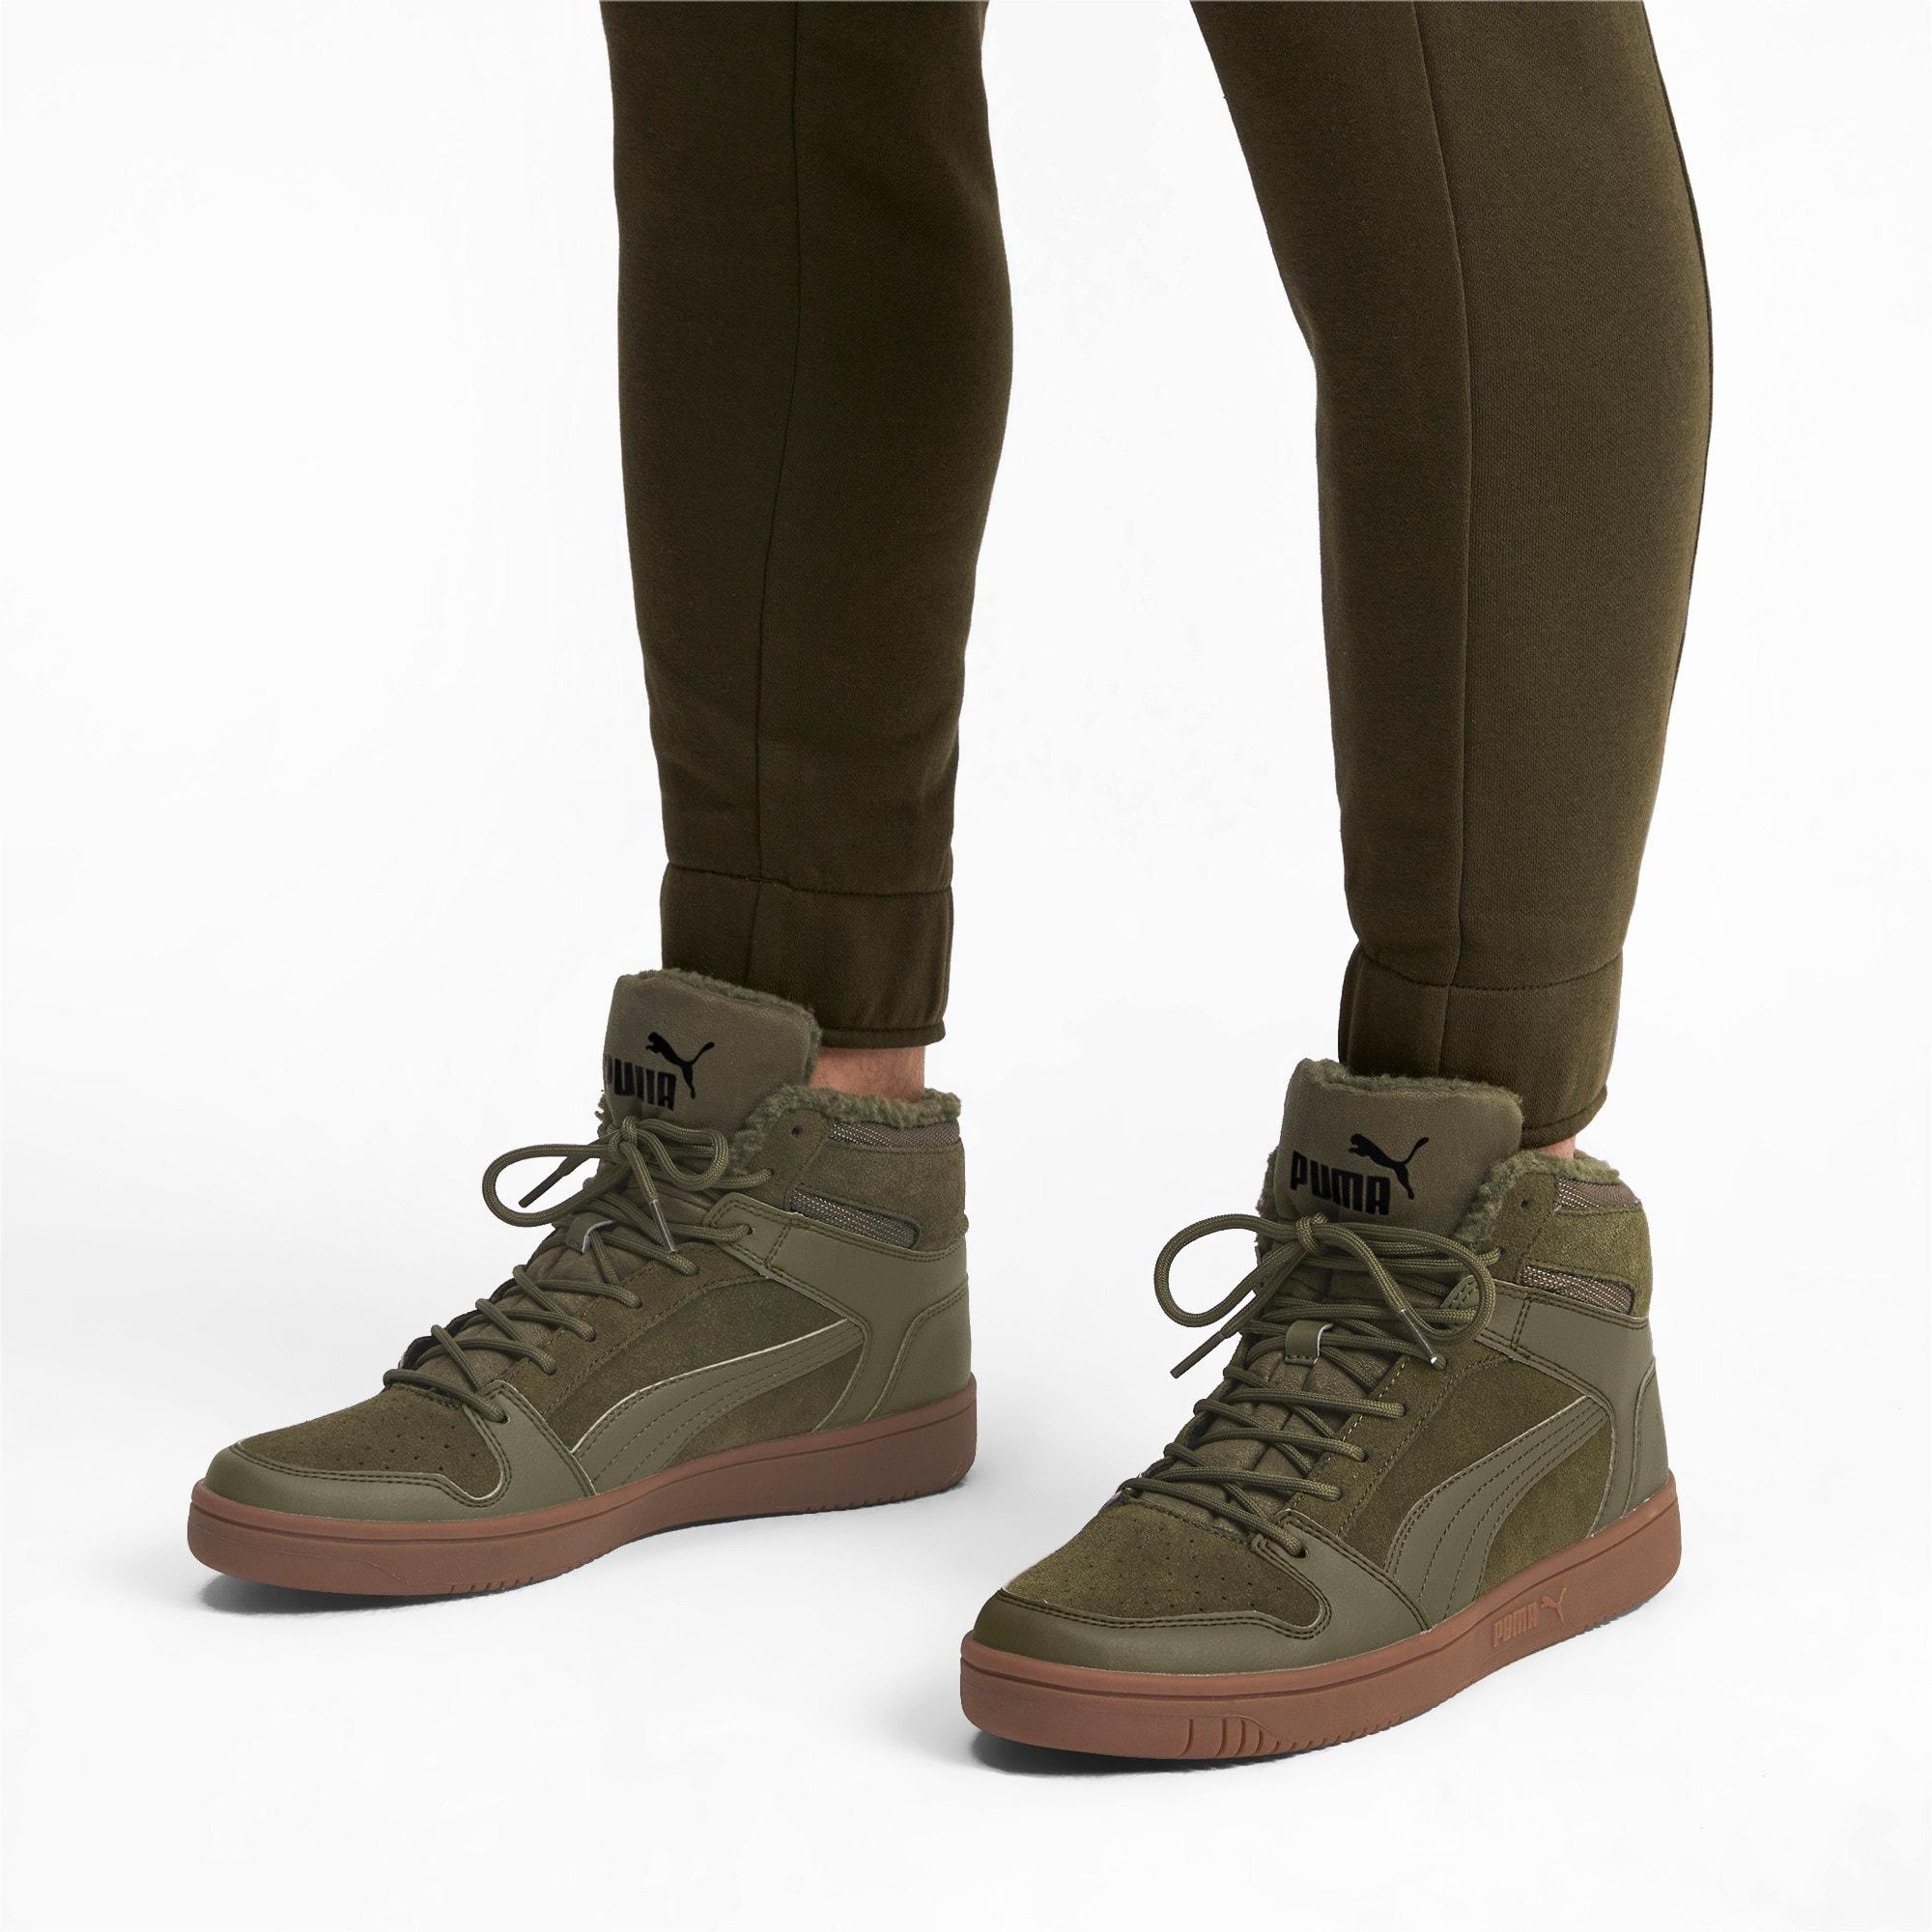 Thumbnail 2 of Rebound Lay Up SD Fur Sneaker, Burnt Olive-Puma Black-Gum, medium